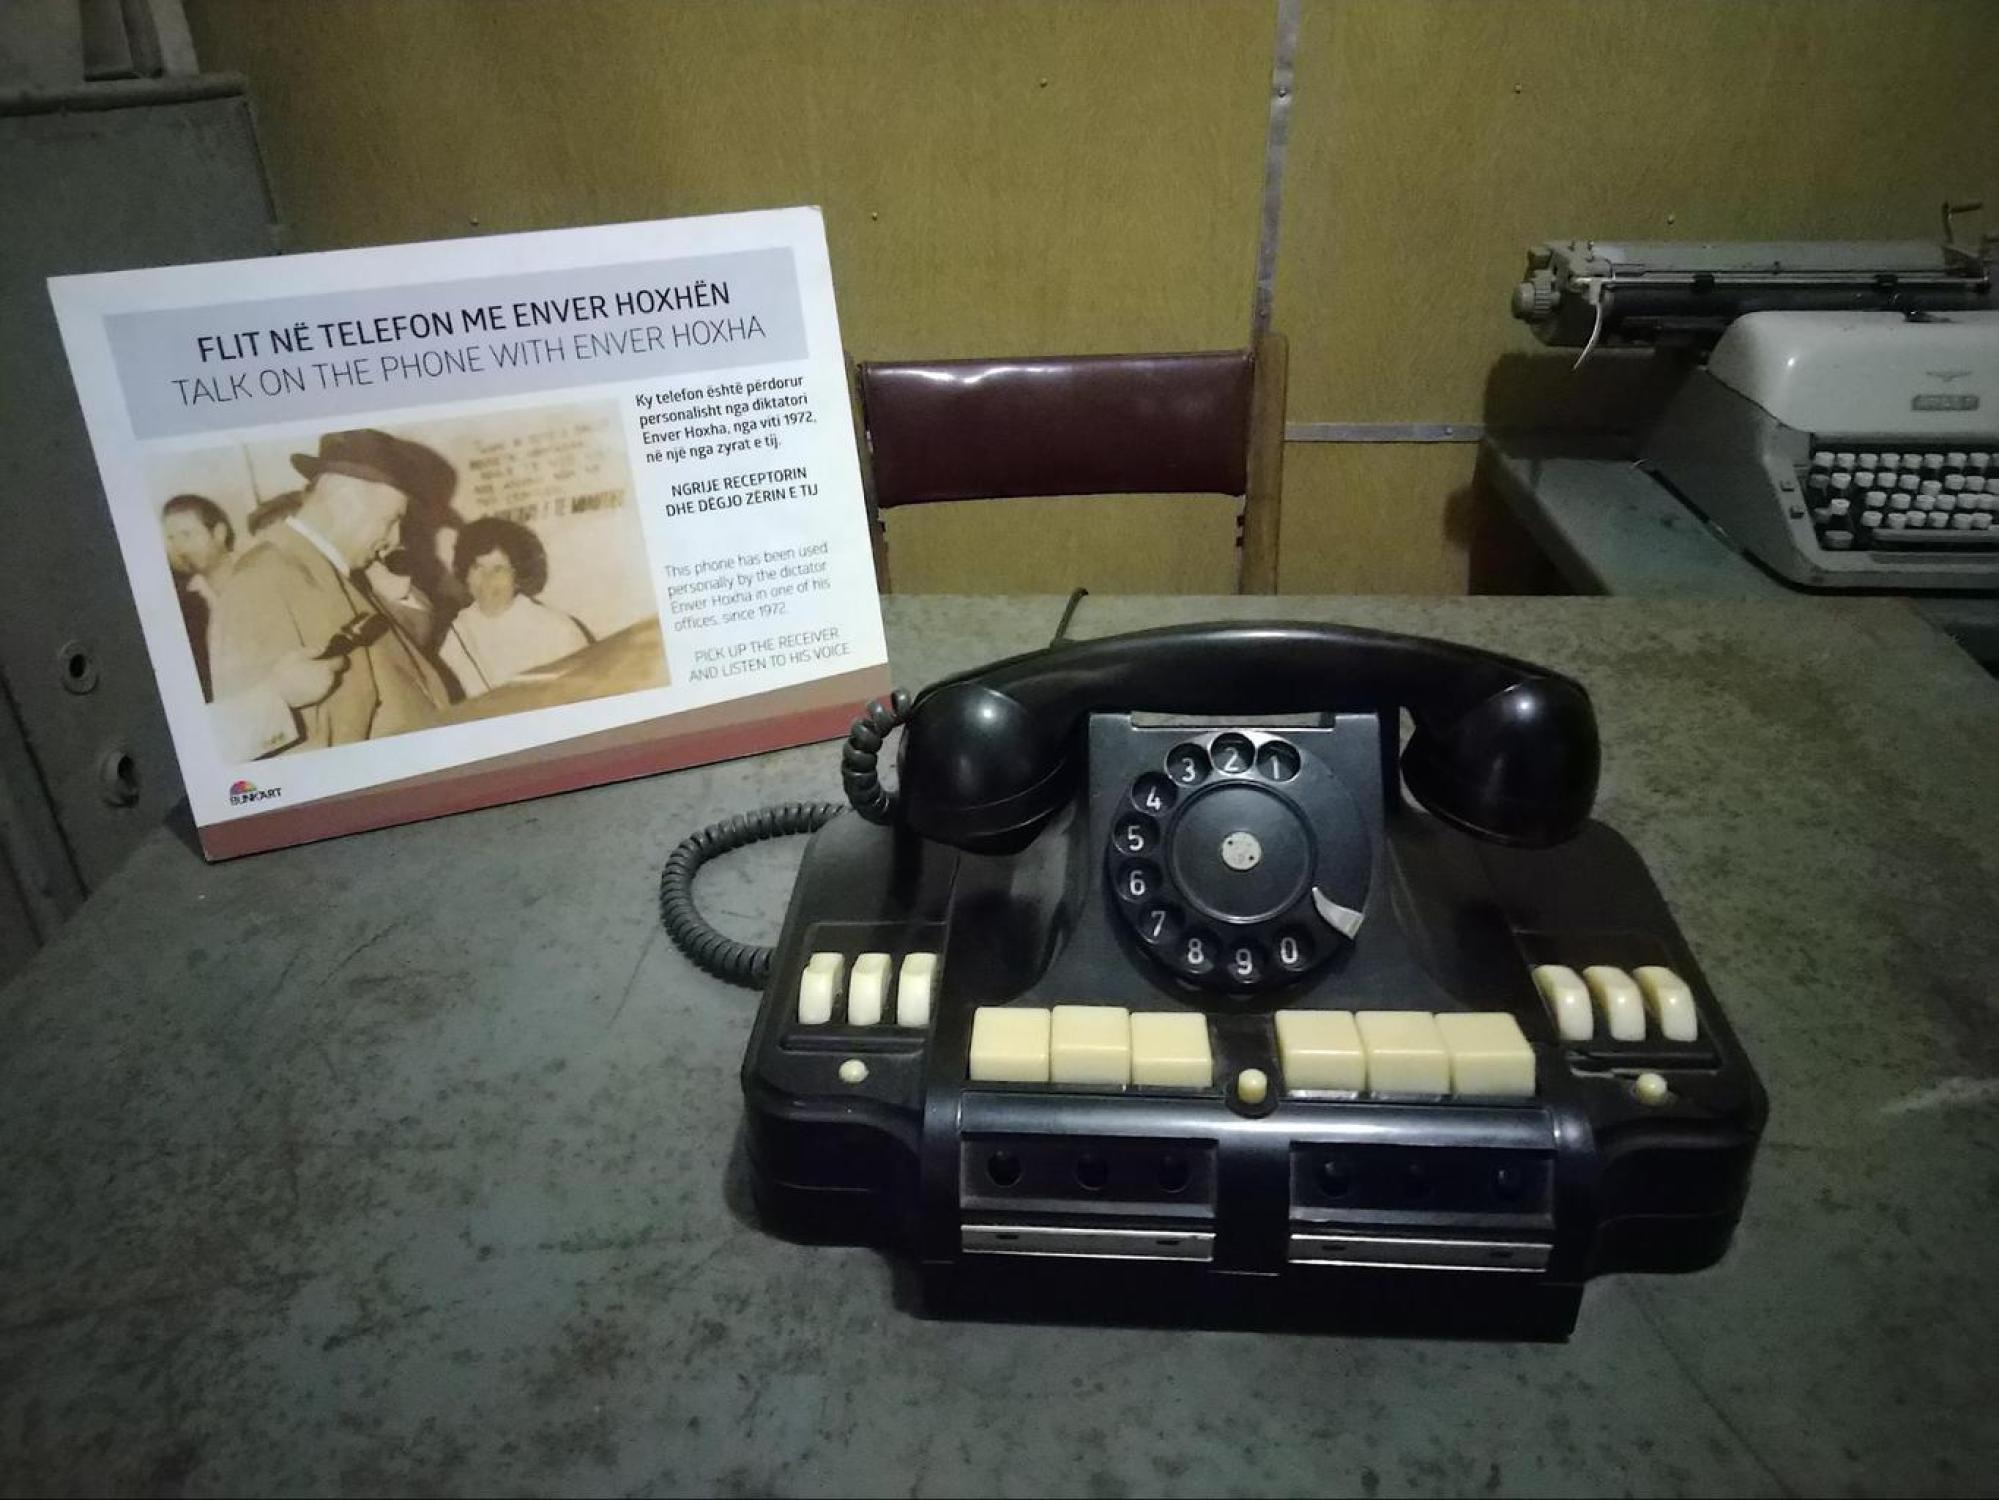 Enver Hoxha's phone